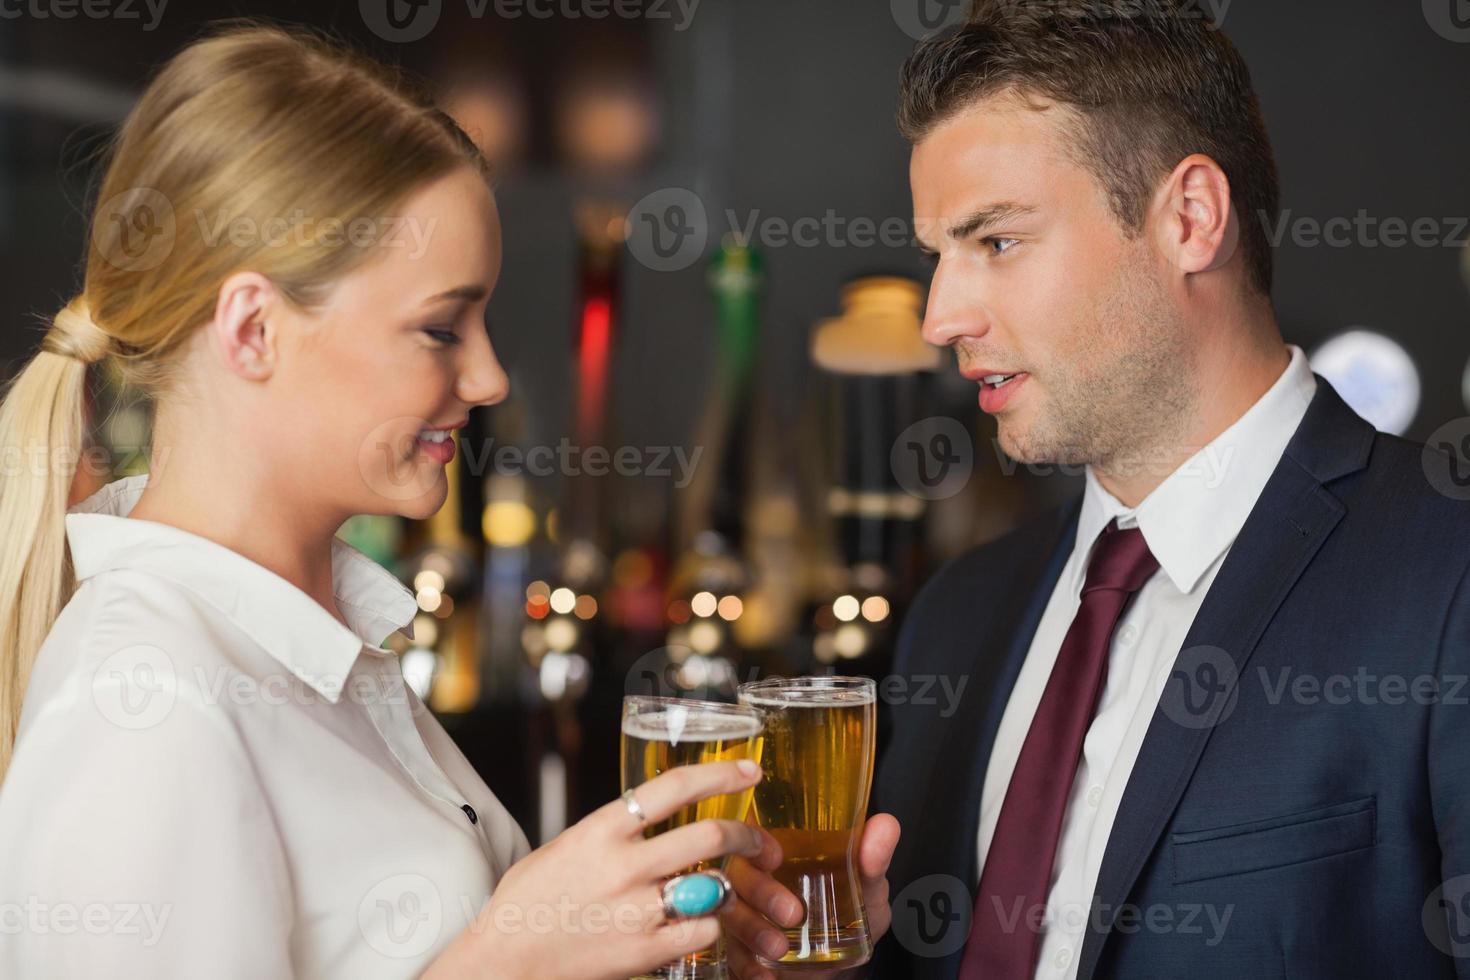 colegas chocan sus vasos de cerveza foto